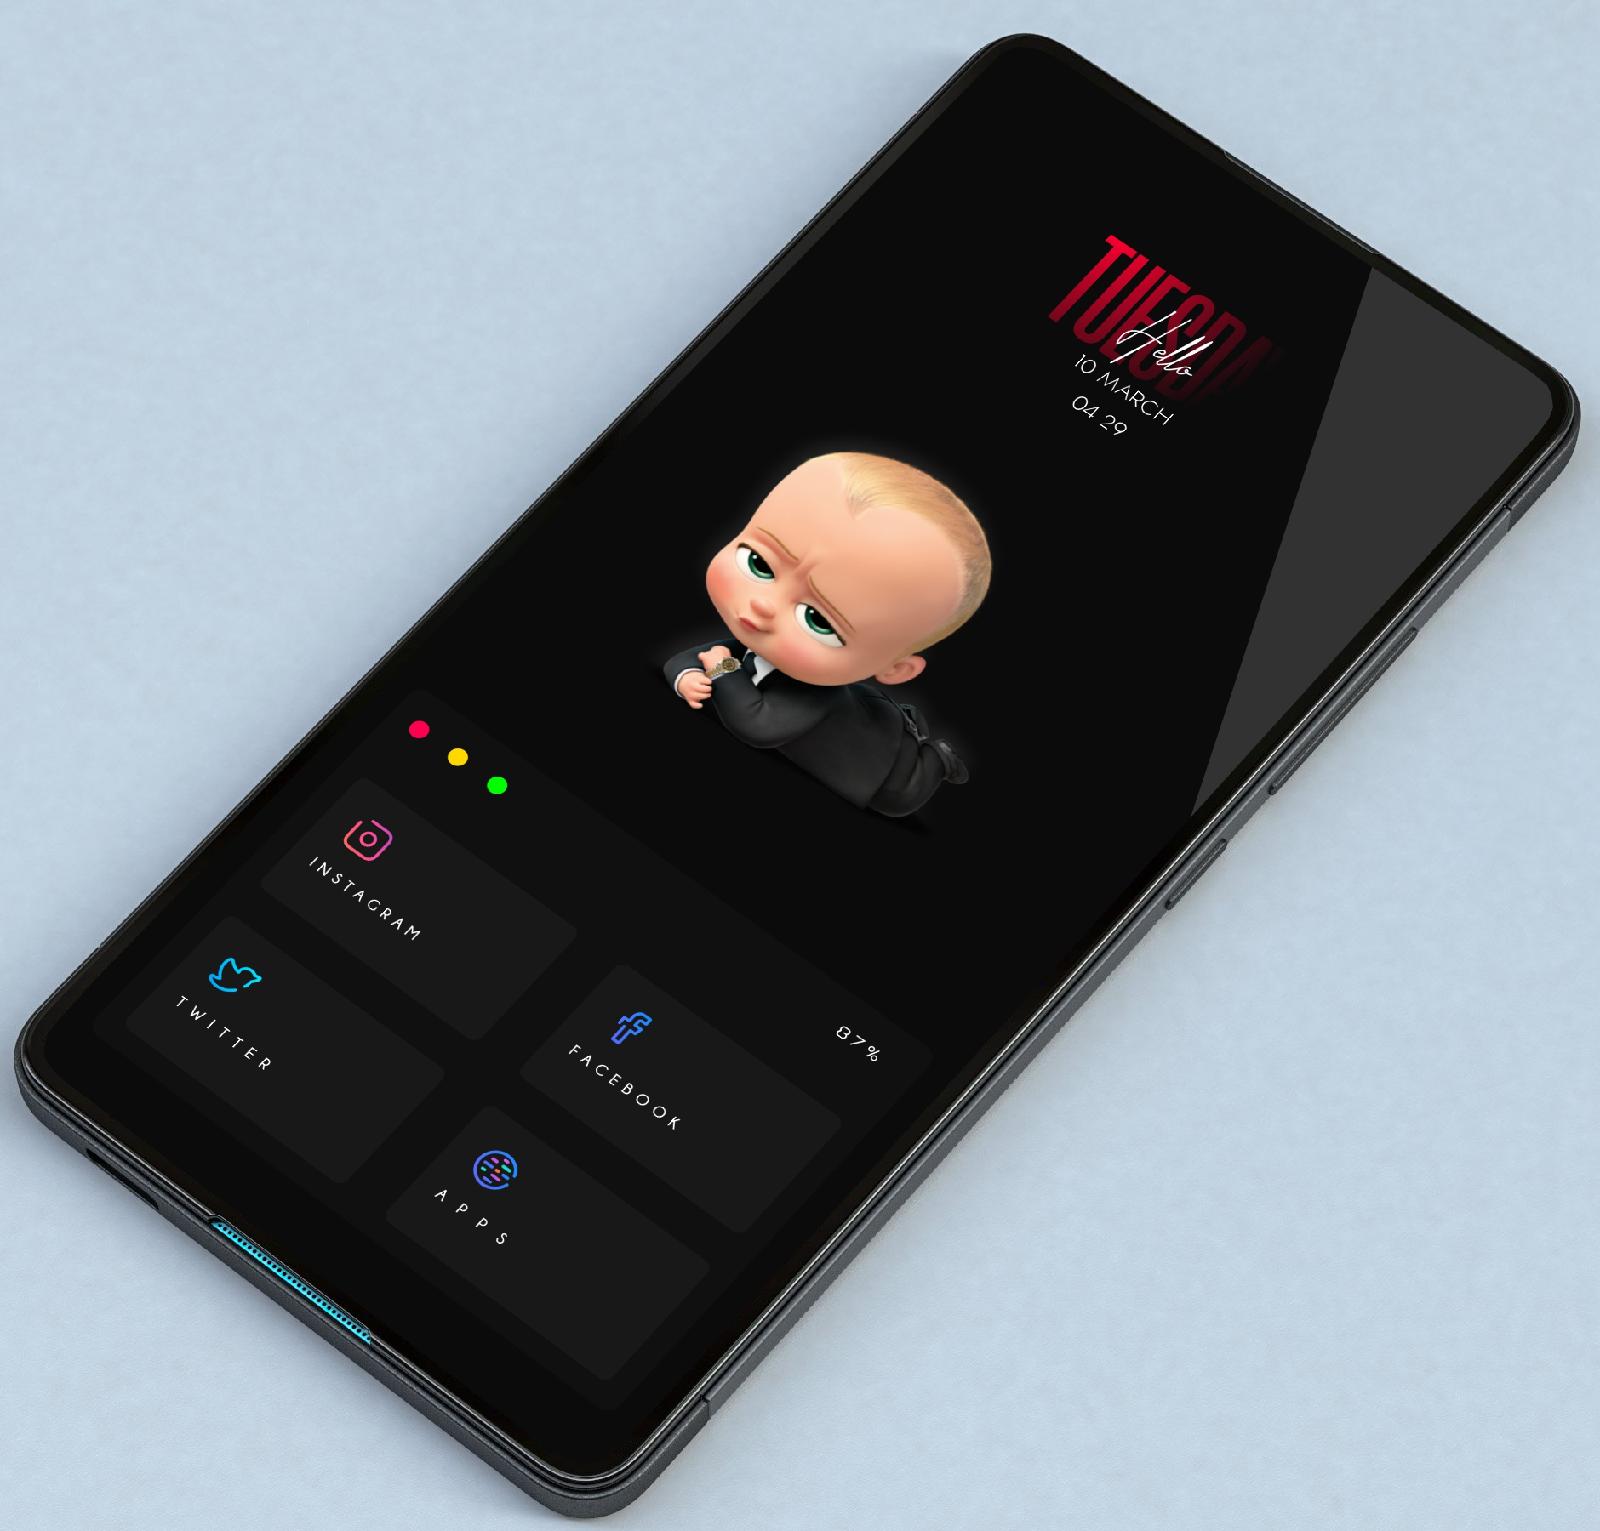 Dark hipster screen in 2020 Screen, Android phone, Dark